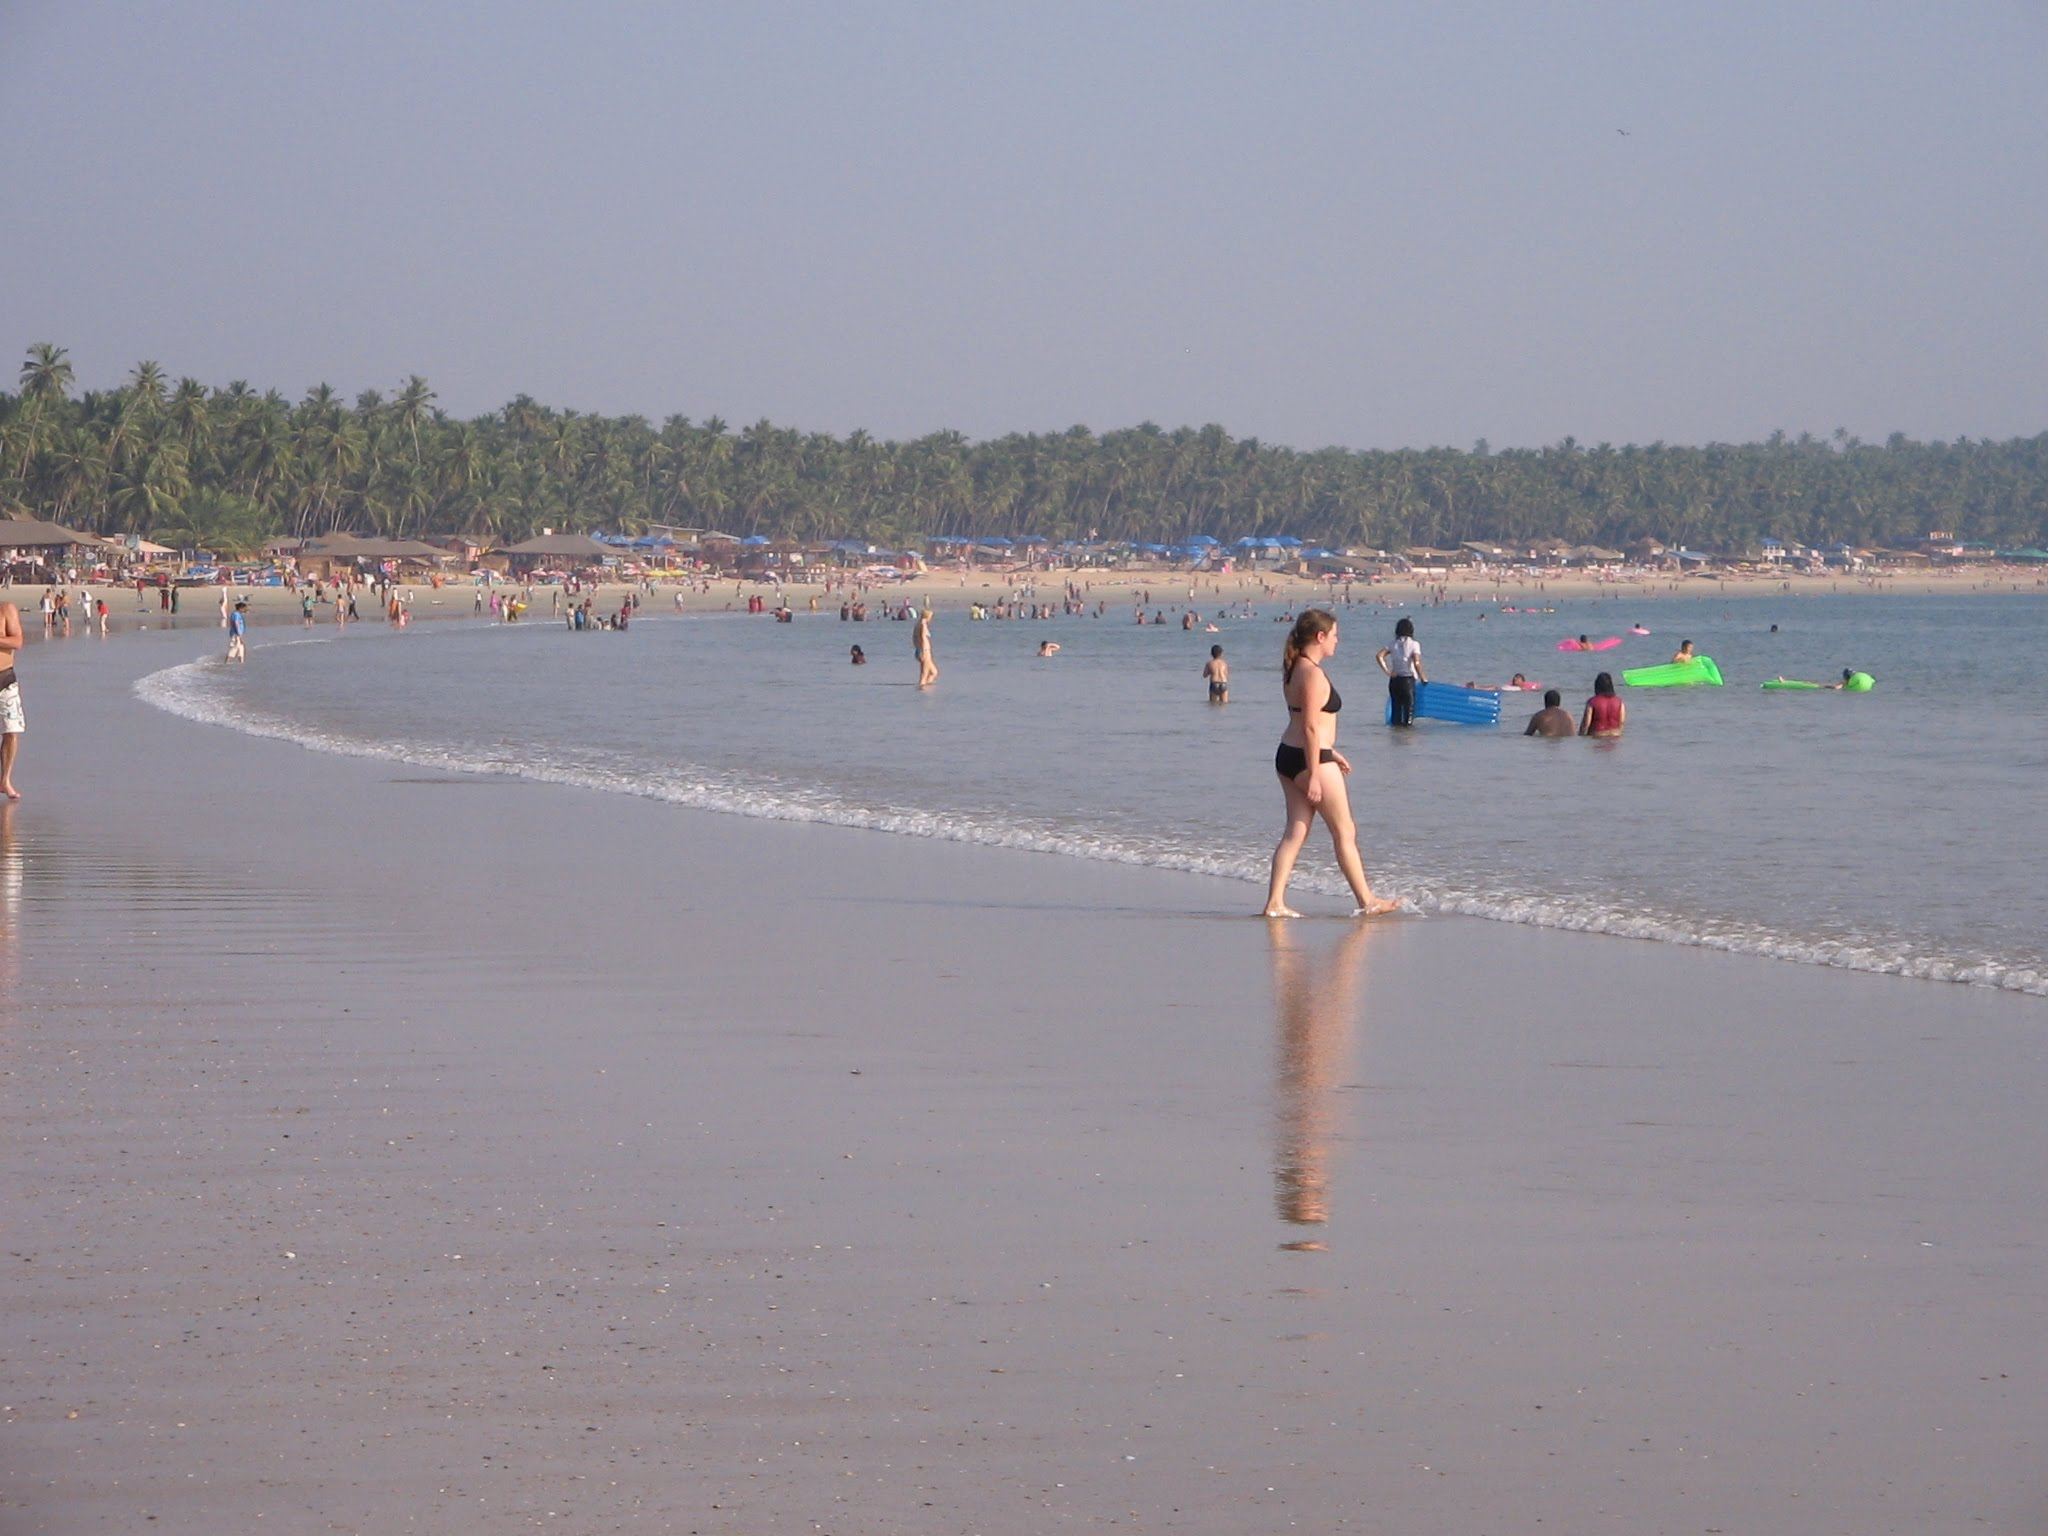 Hot Image Of Goa Beach - Impremedianet-1766